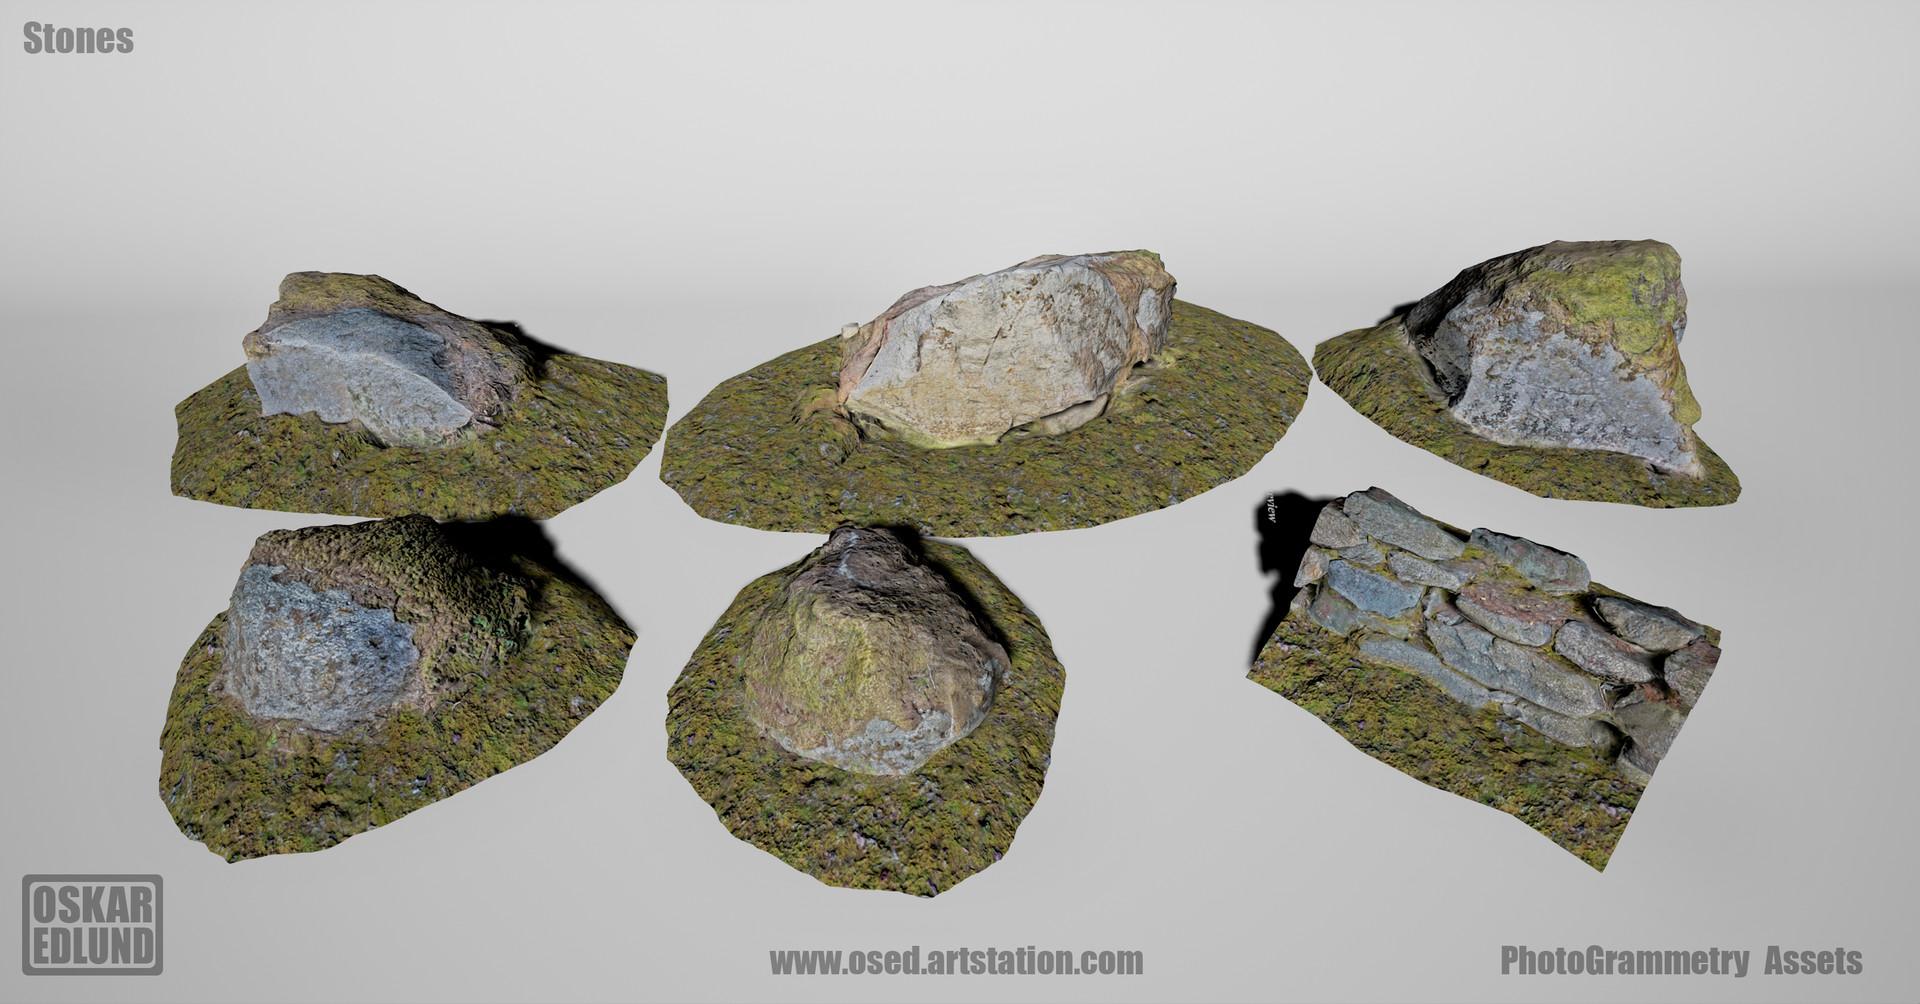 Oskar edlund stones